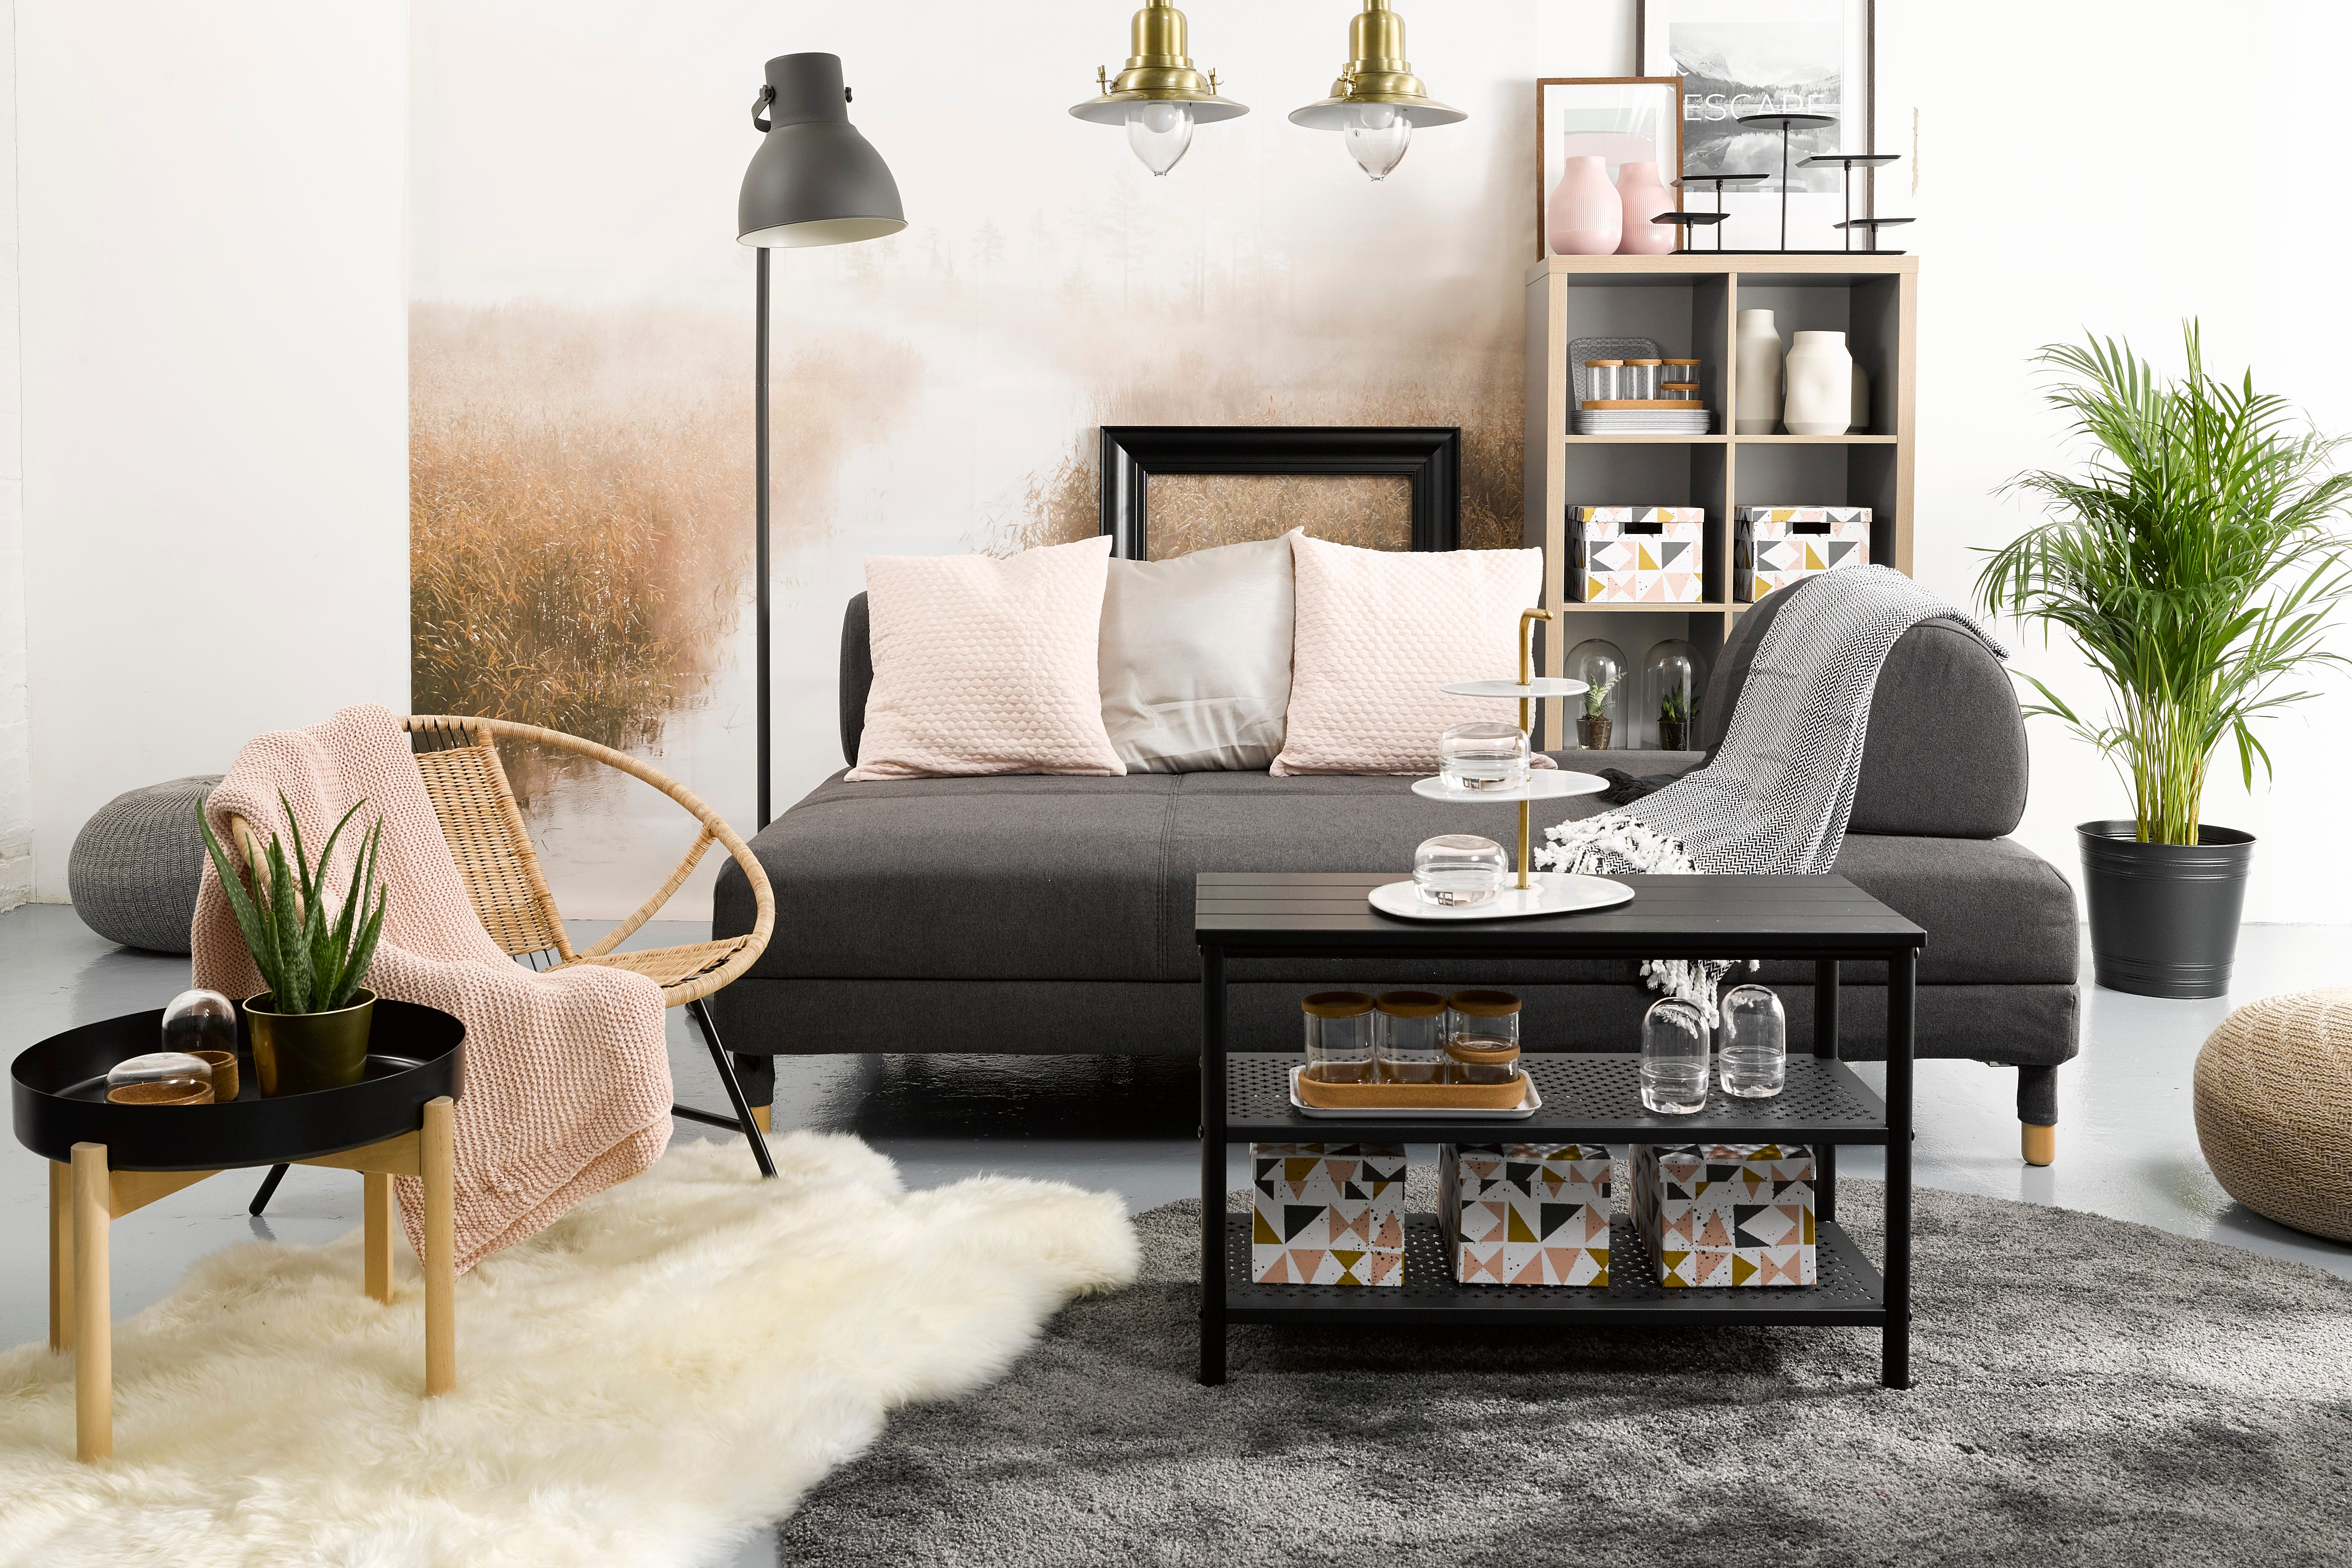 Ikea Sinnerlig Hanglamp : Ikea interior trends for u autumn winter look book